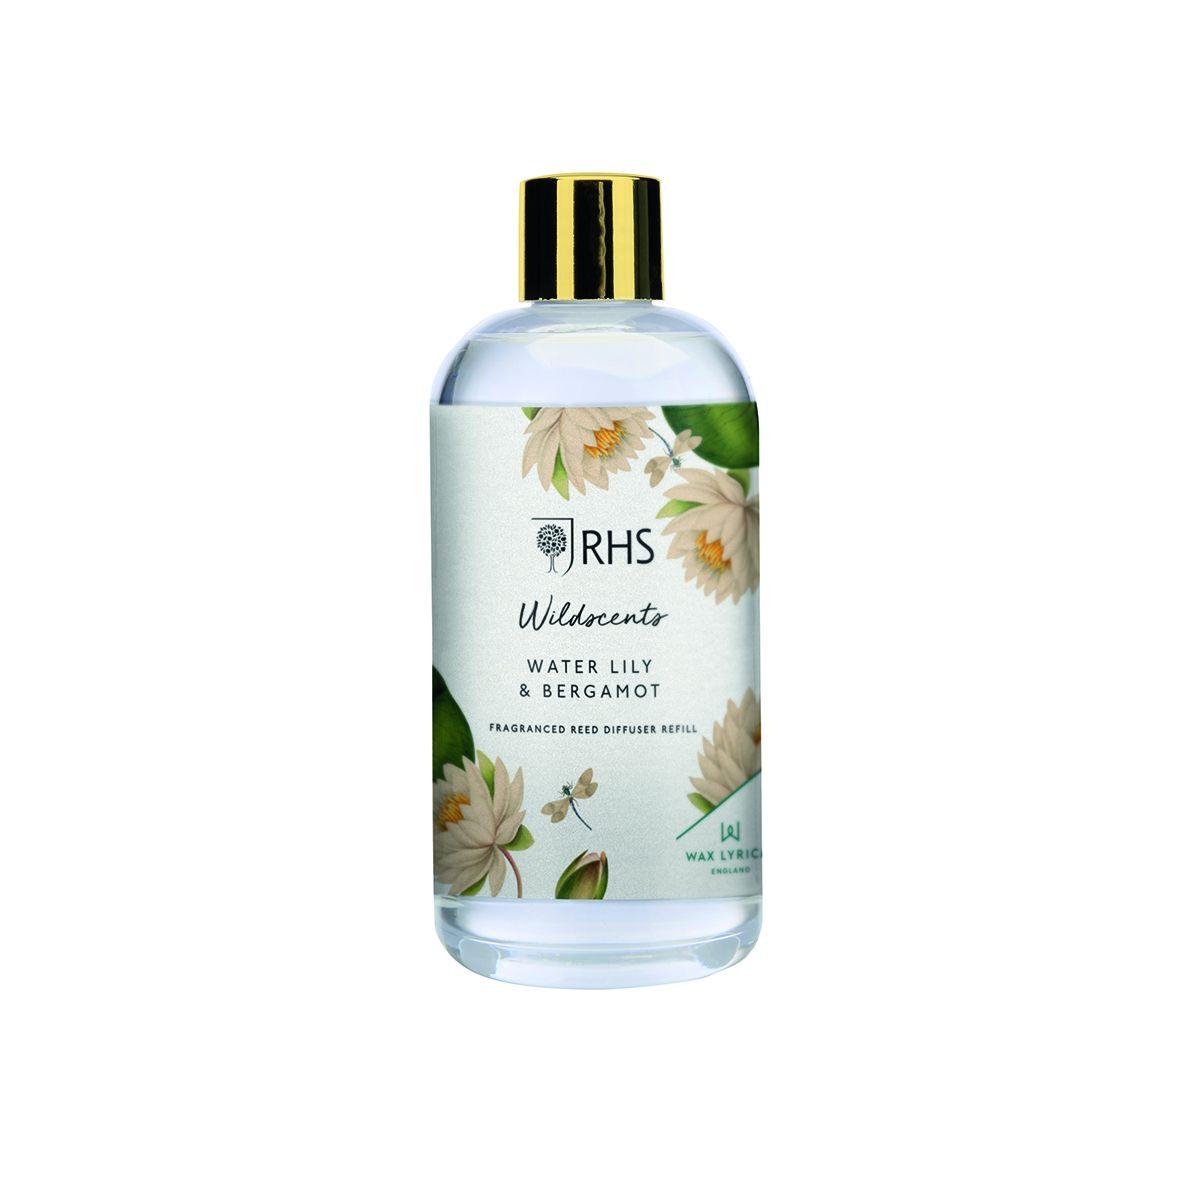 Water Lily & Bergamot 200ml Diffuser Refill